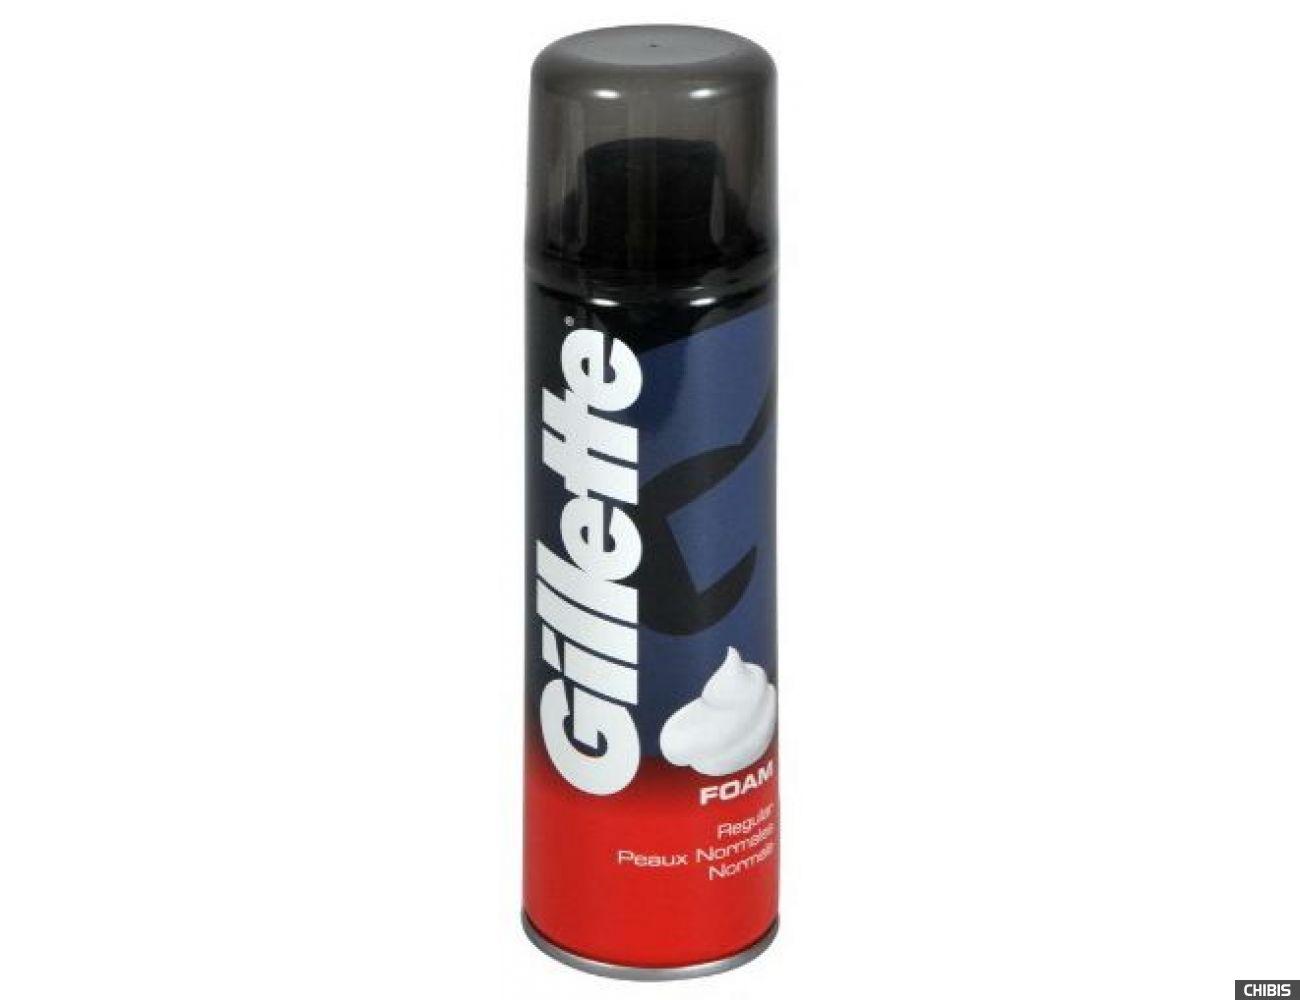 Gillette пена для бритья Regular 200 мл.